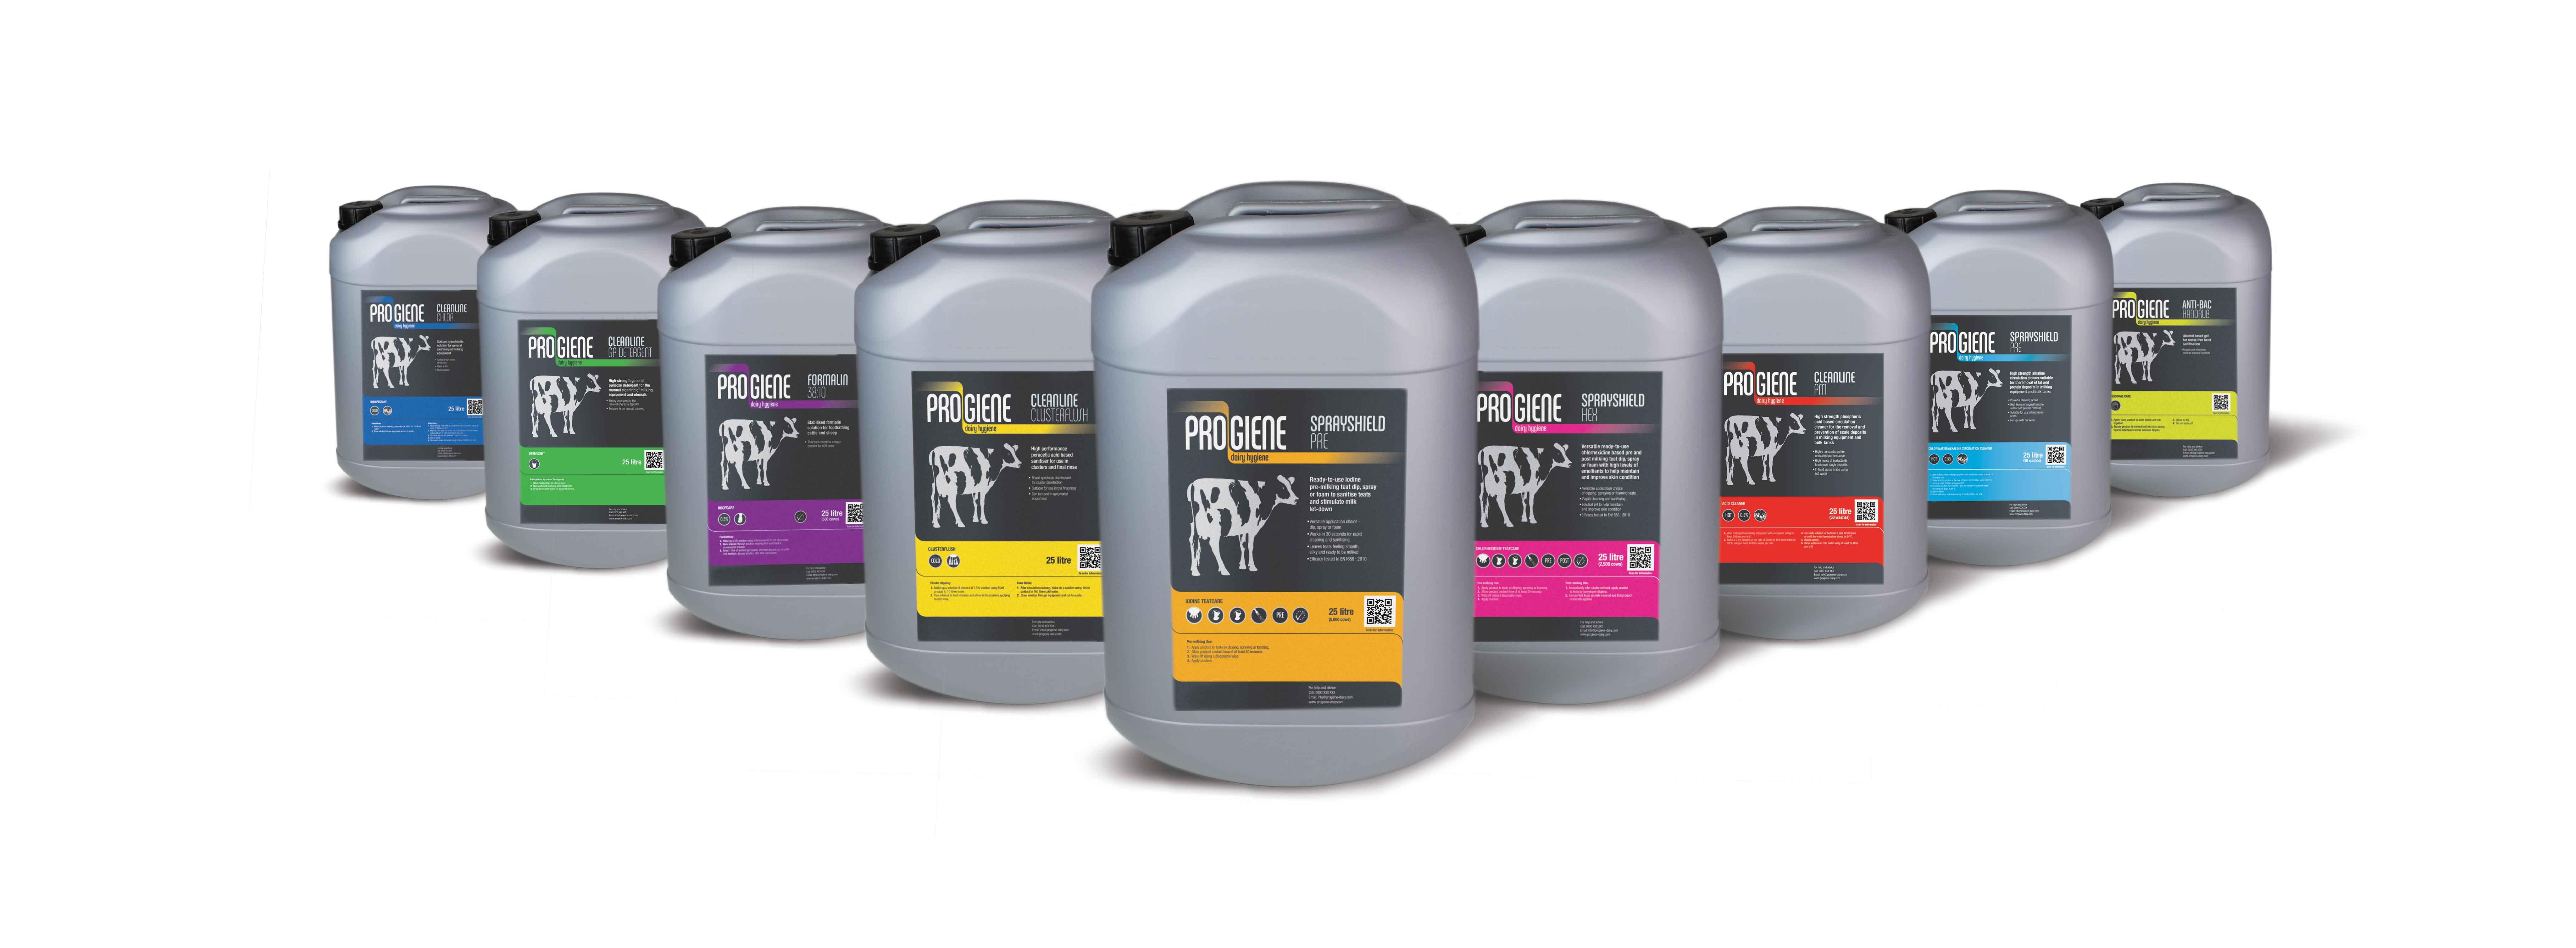 Progiene dairy hygiene products